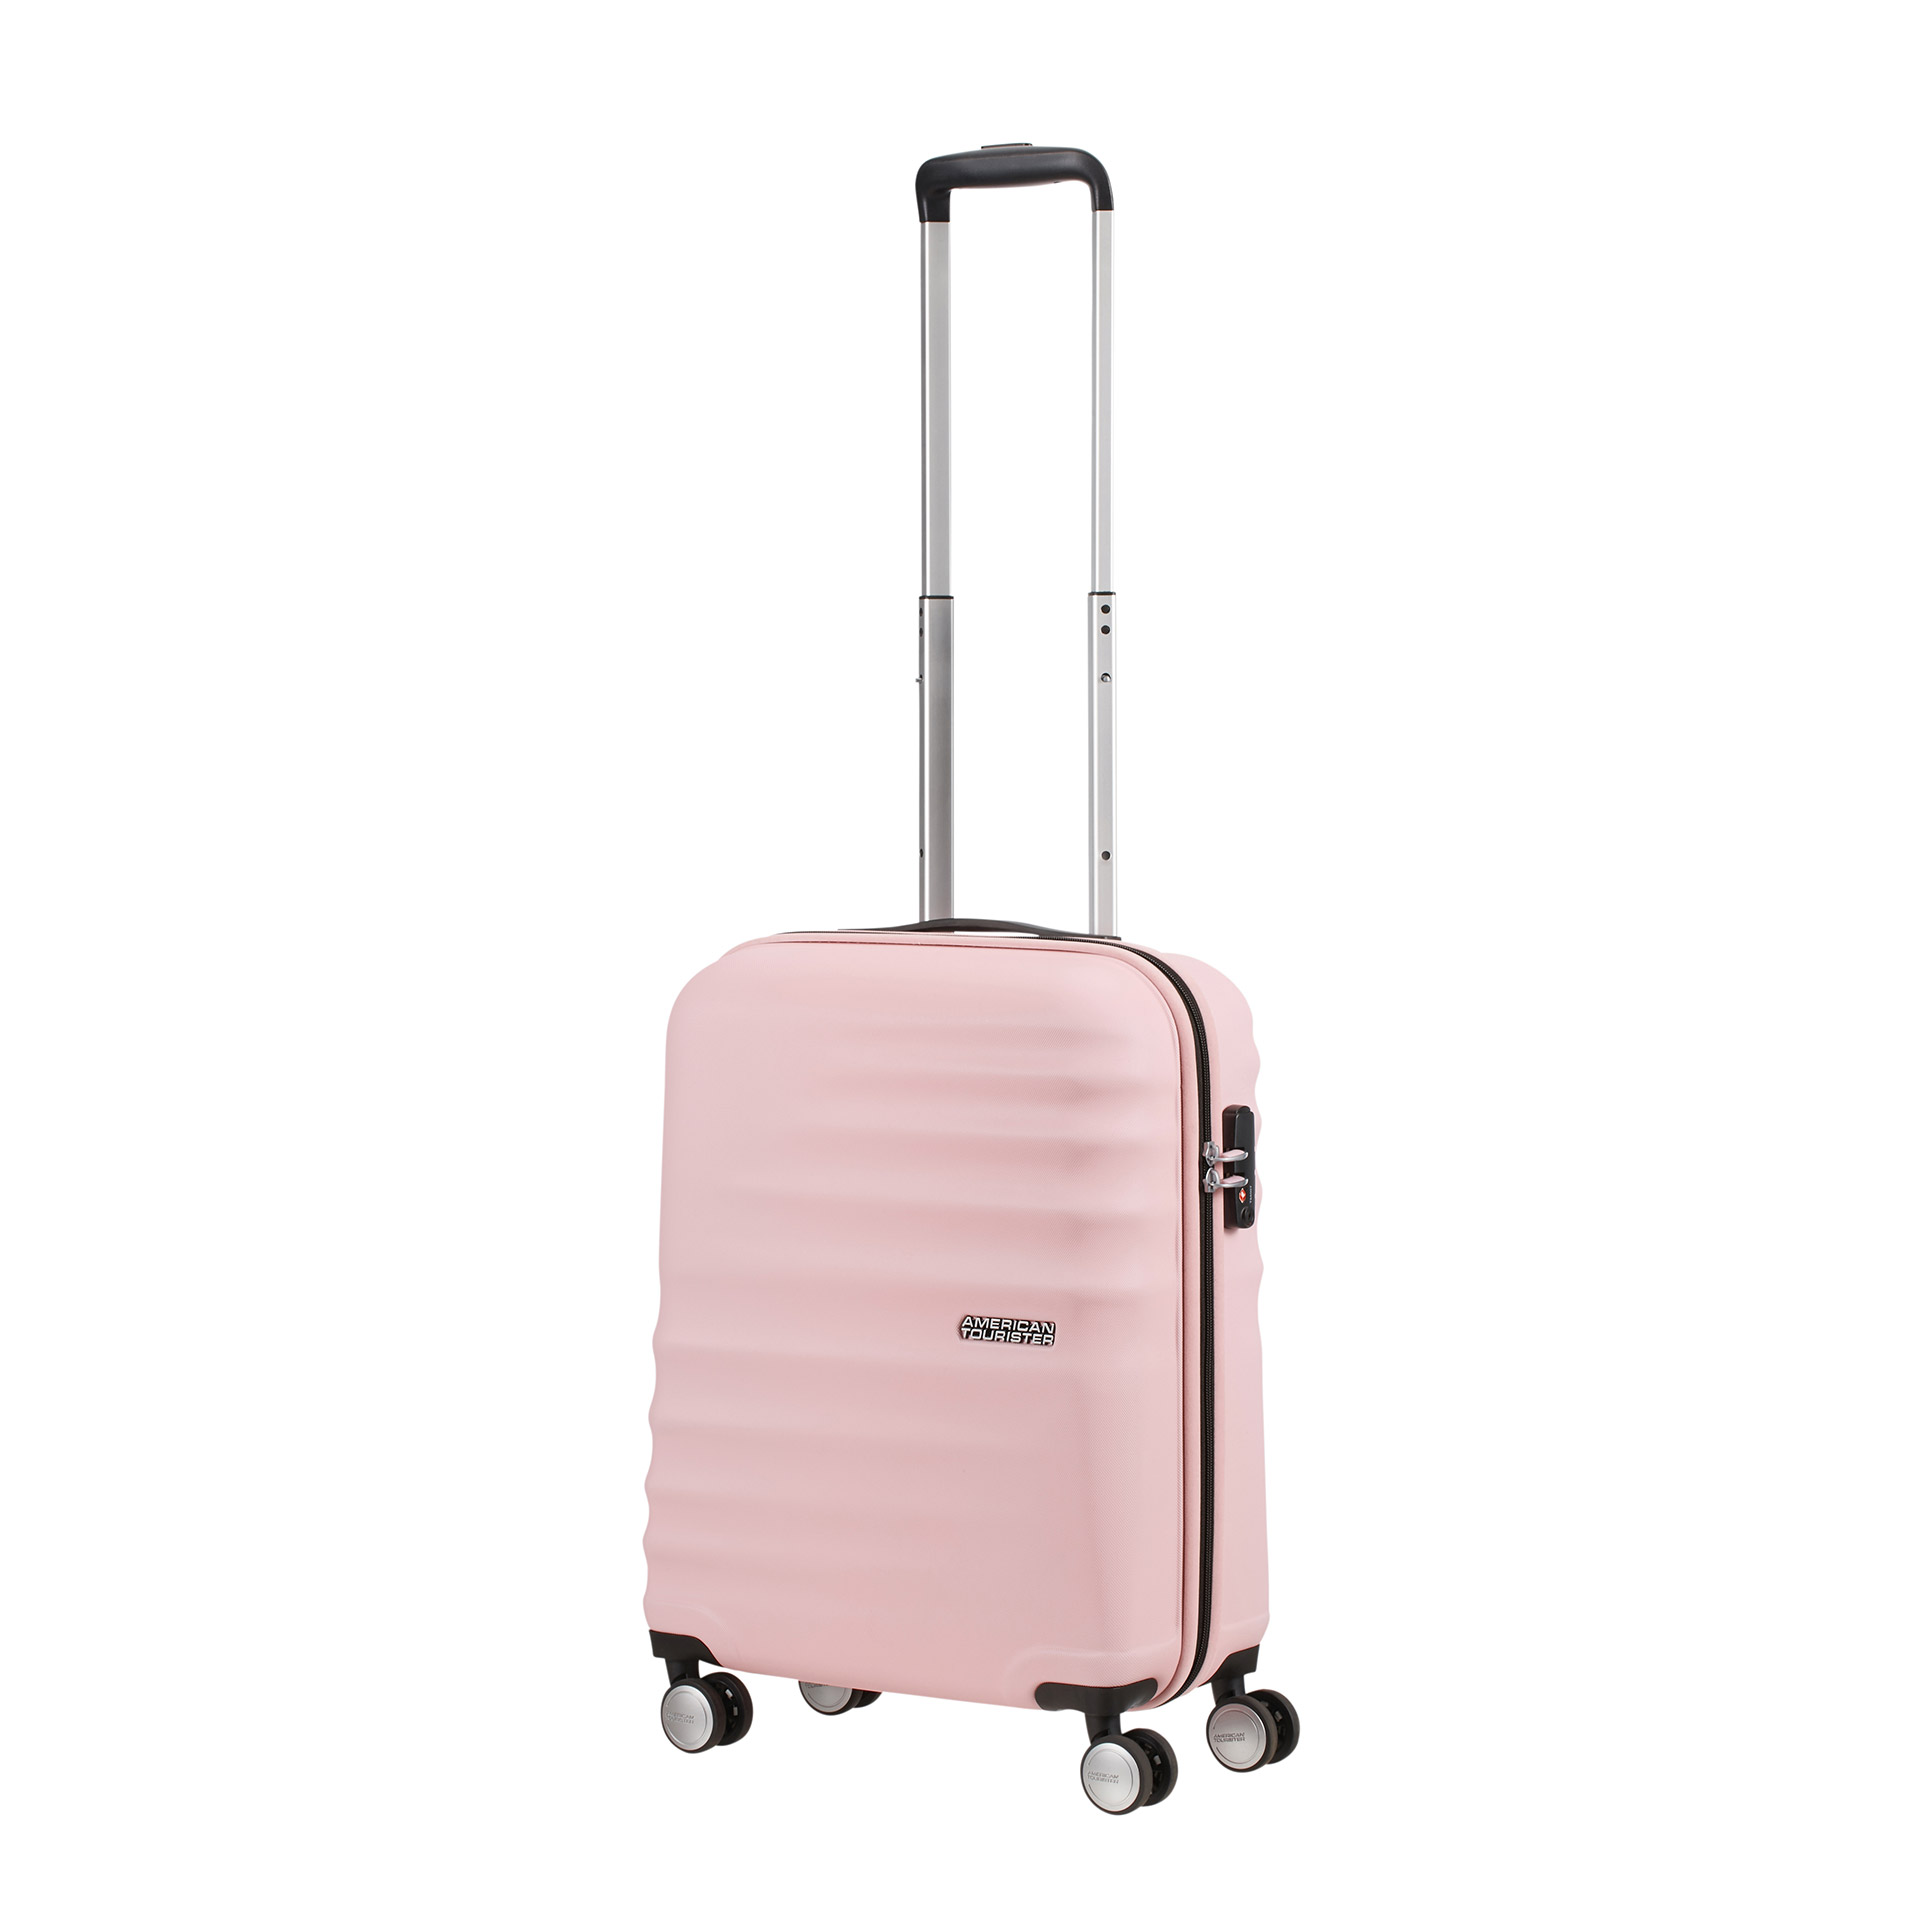 Wavebraker 4-Rad Trolley 55cm pinkblush